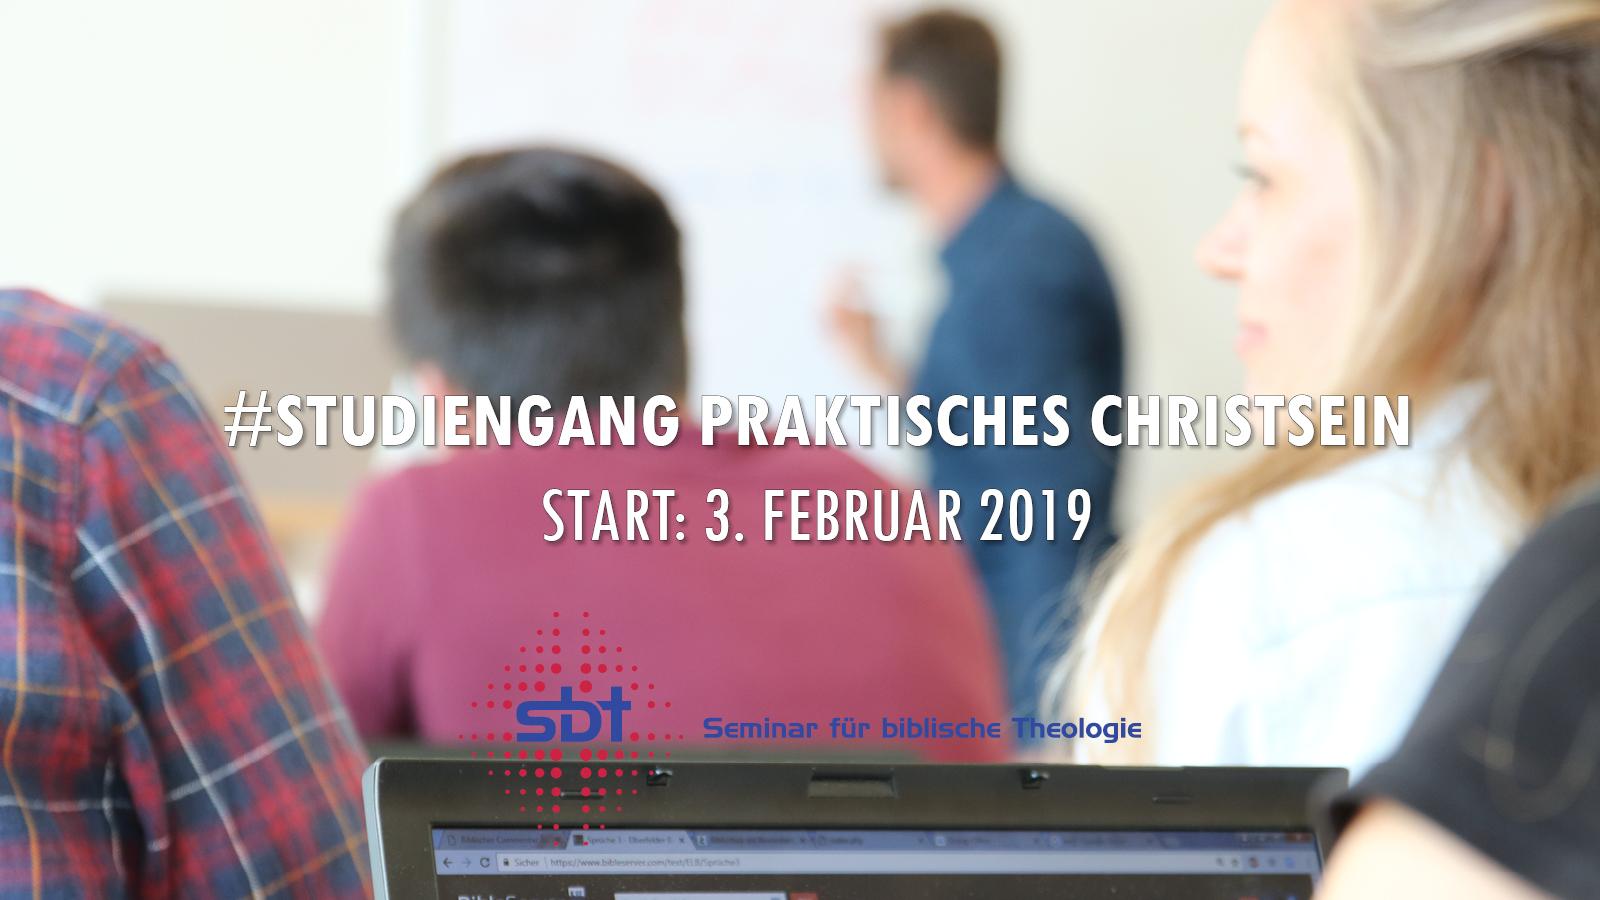 Studiengang Praktisches Christsein